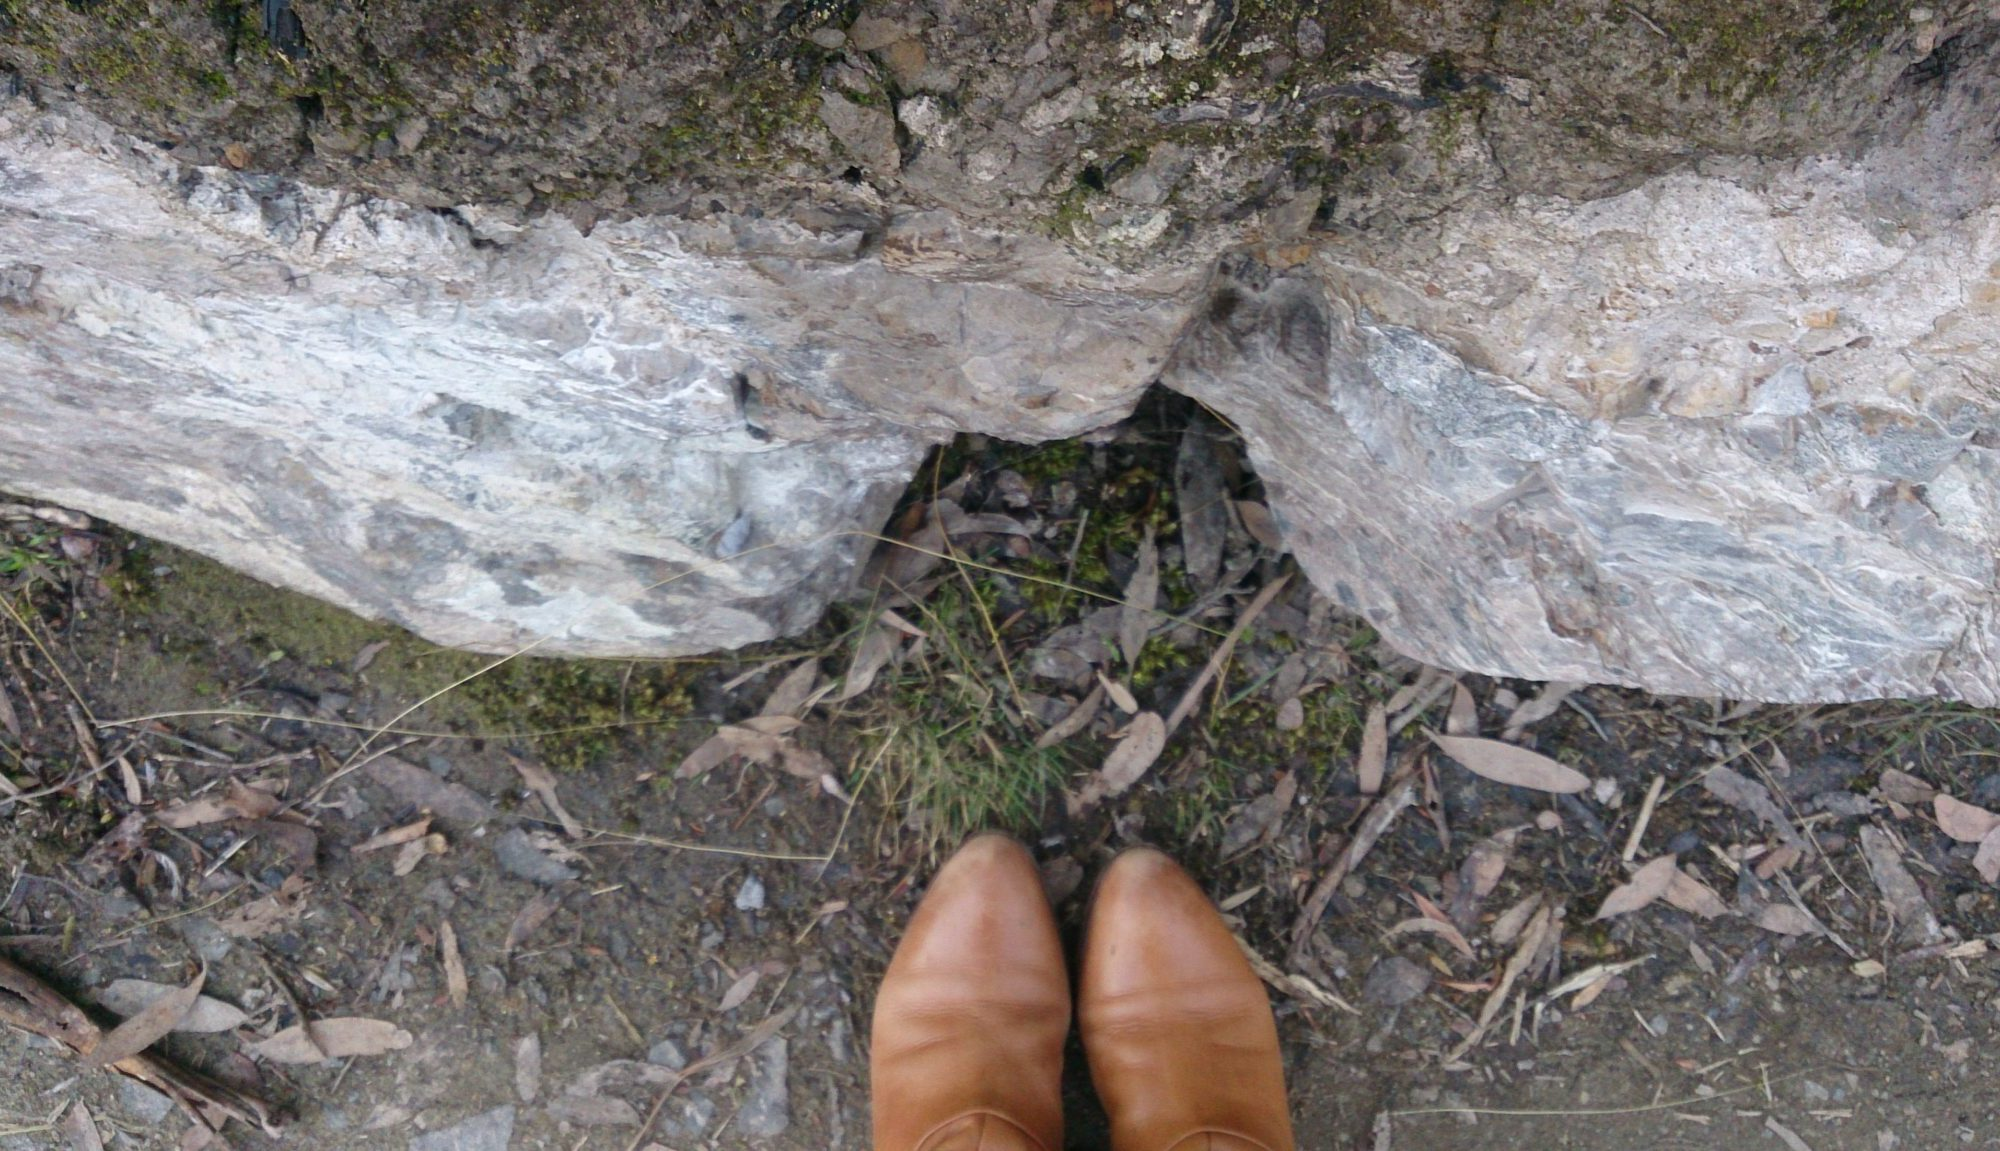 Traversing Tasmans Arch, Devil's Kitchen and The Blowhole